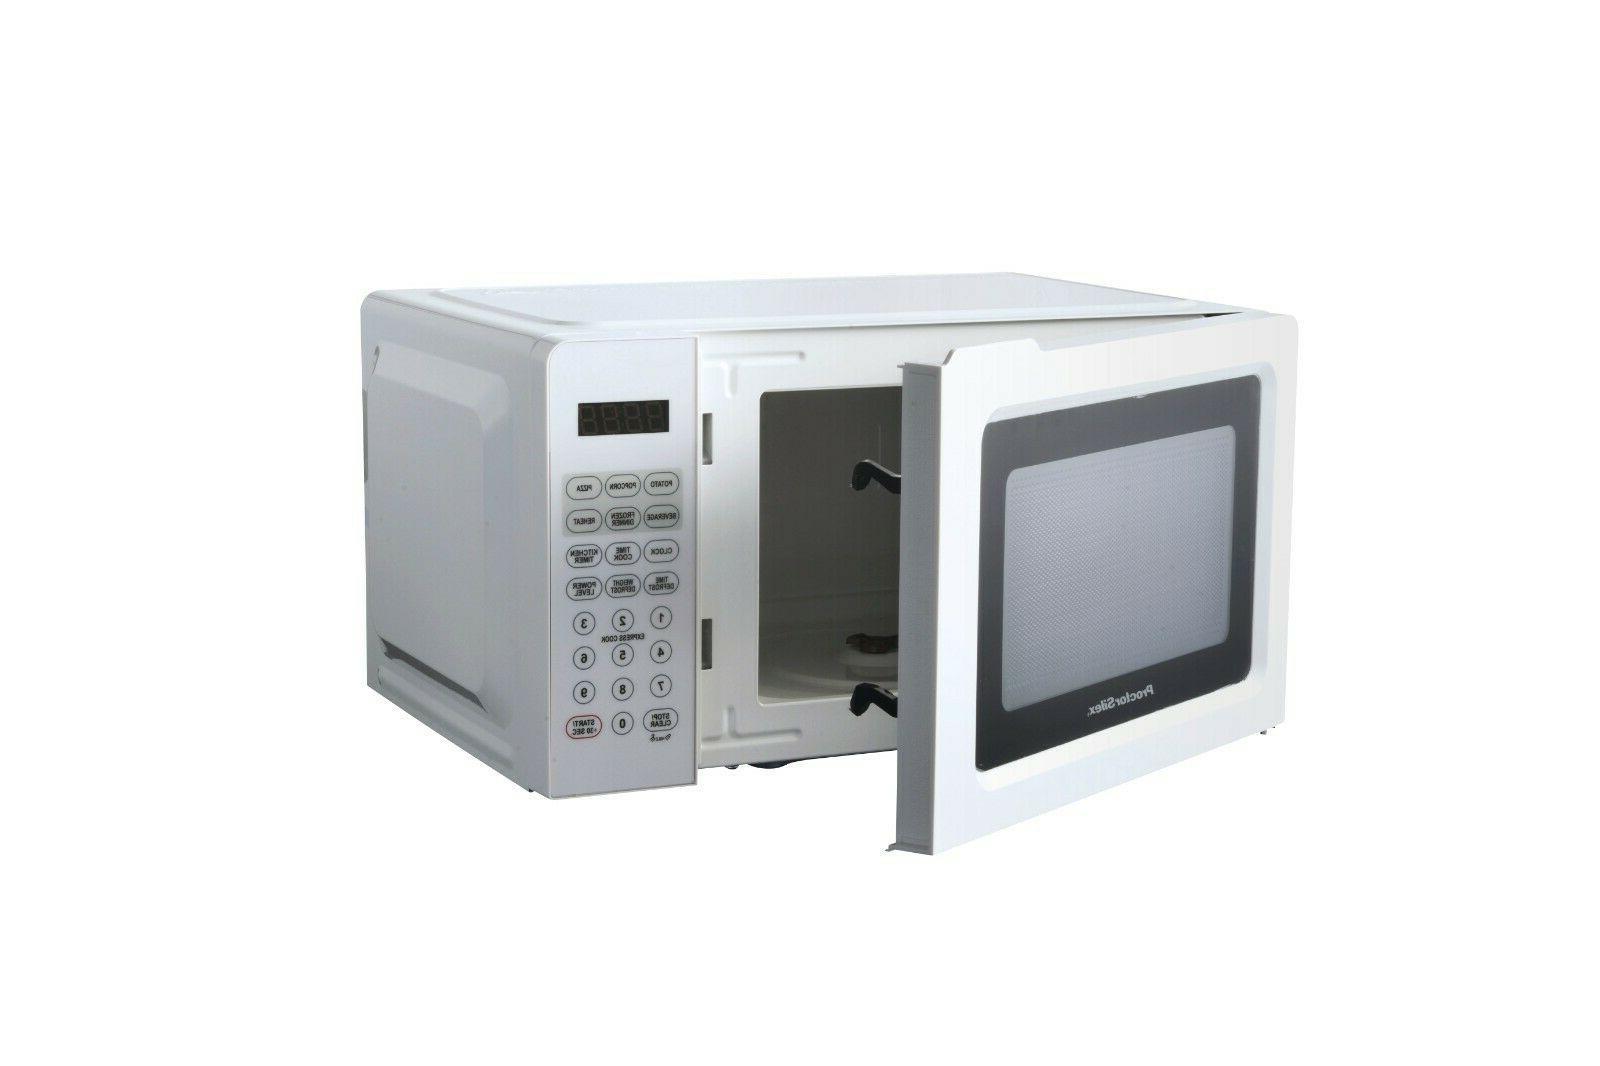 Countertop Microwave Home Digital LED 0.7 700W